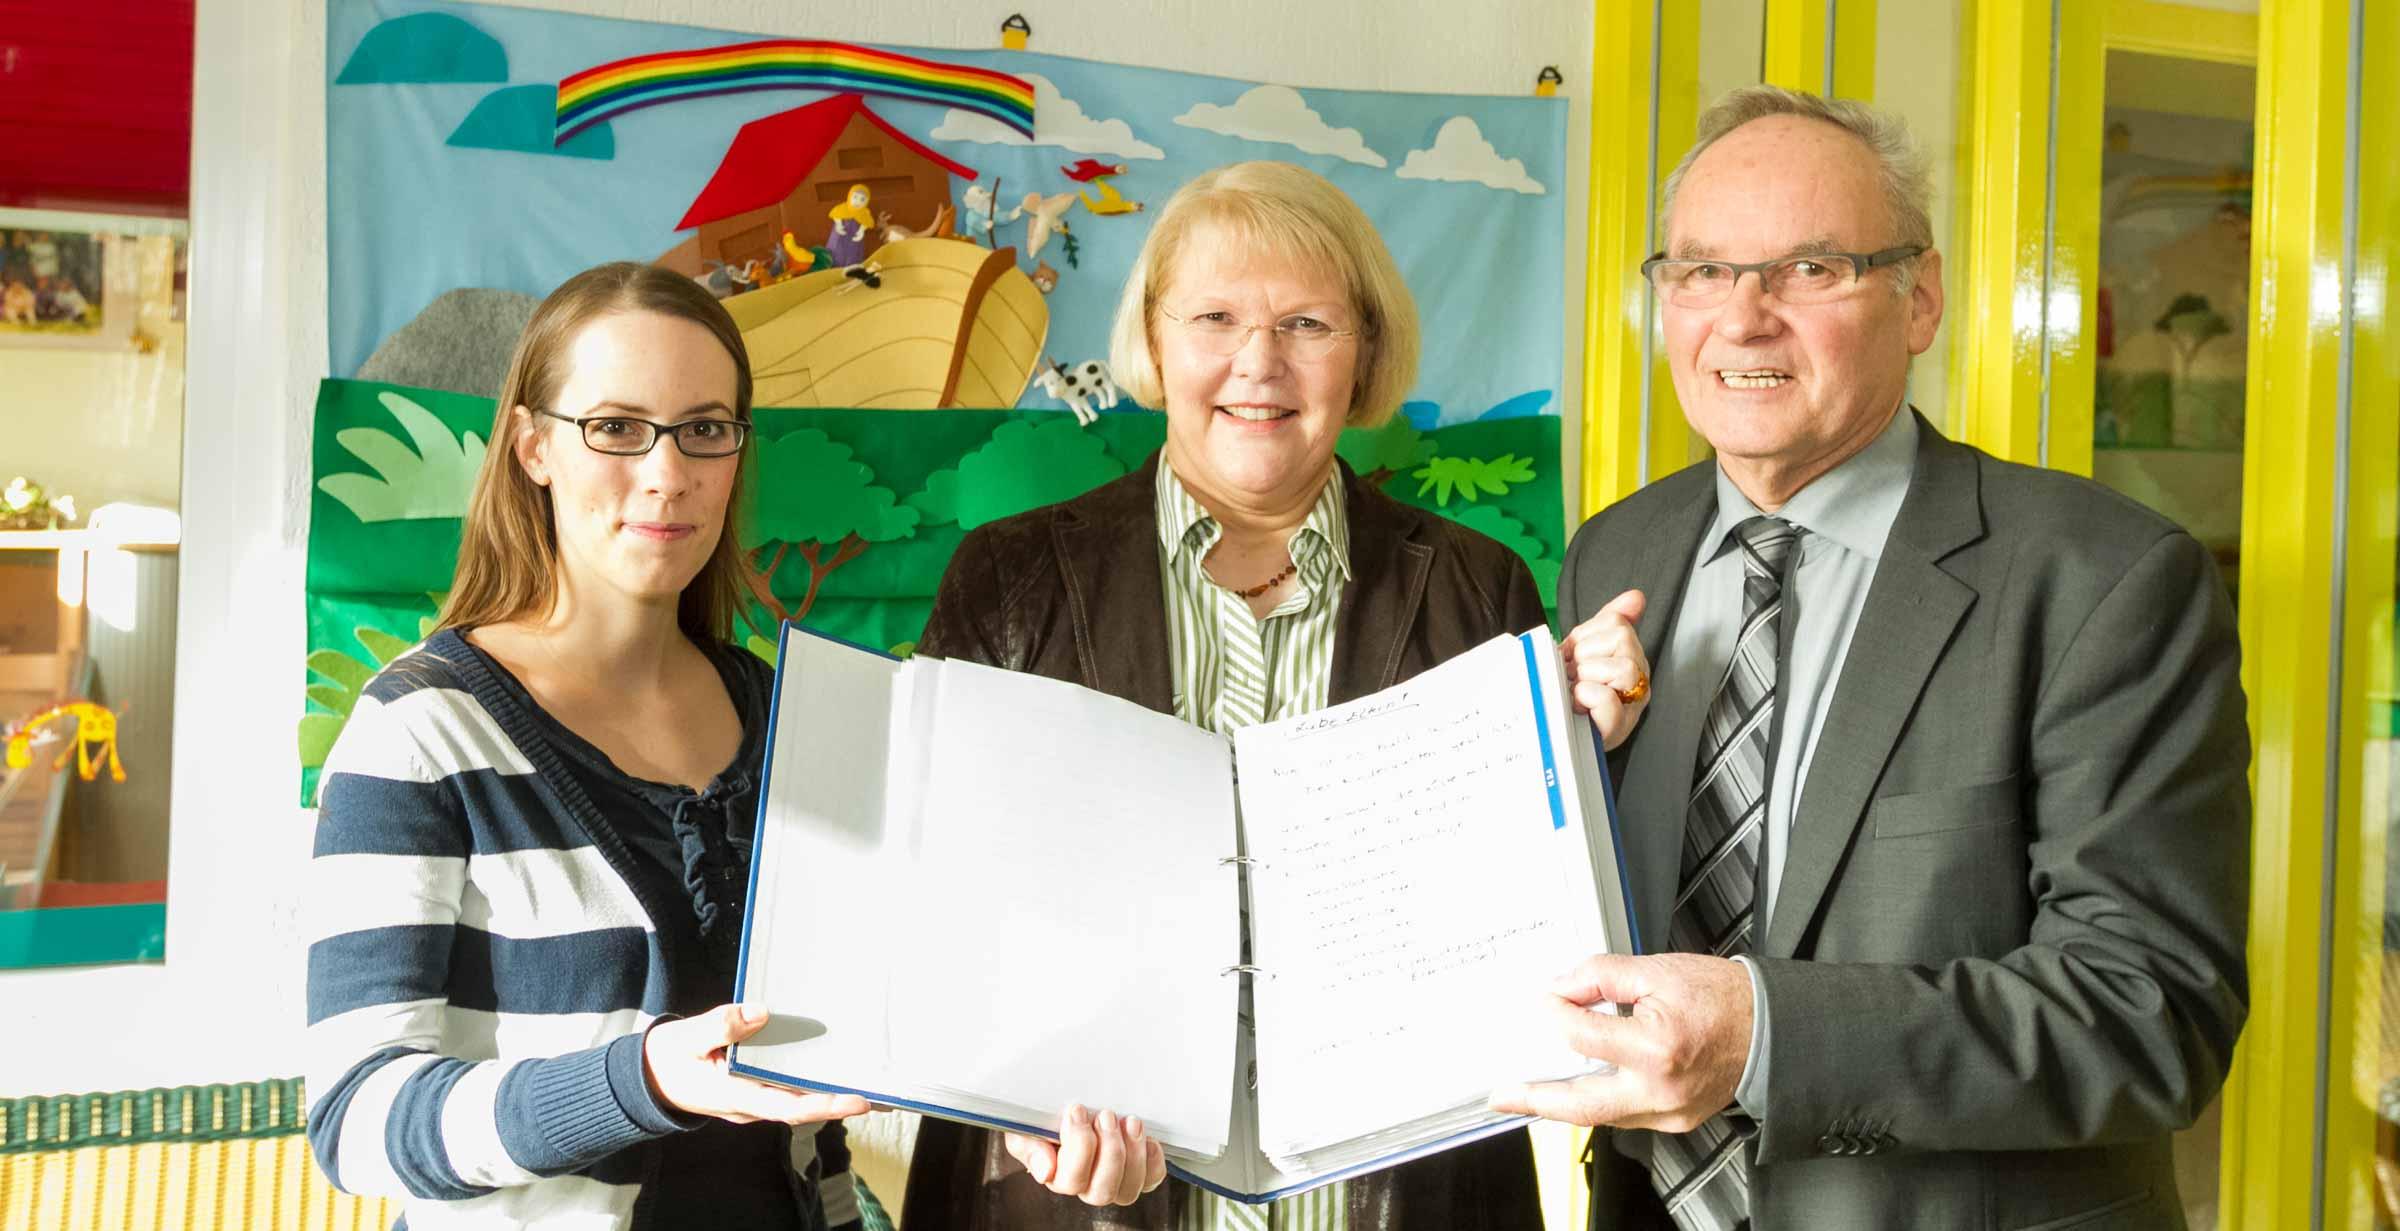 Die Kindertagesstätte Arche Noah in Trappenkamp wurde zertifiziert